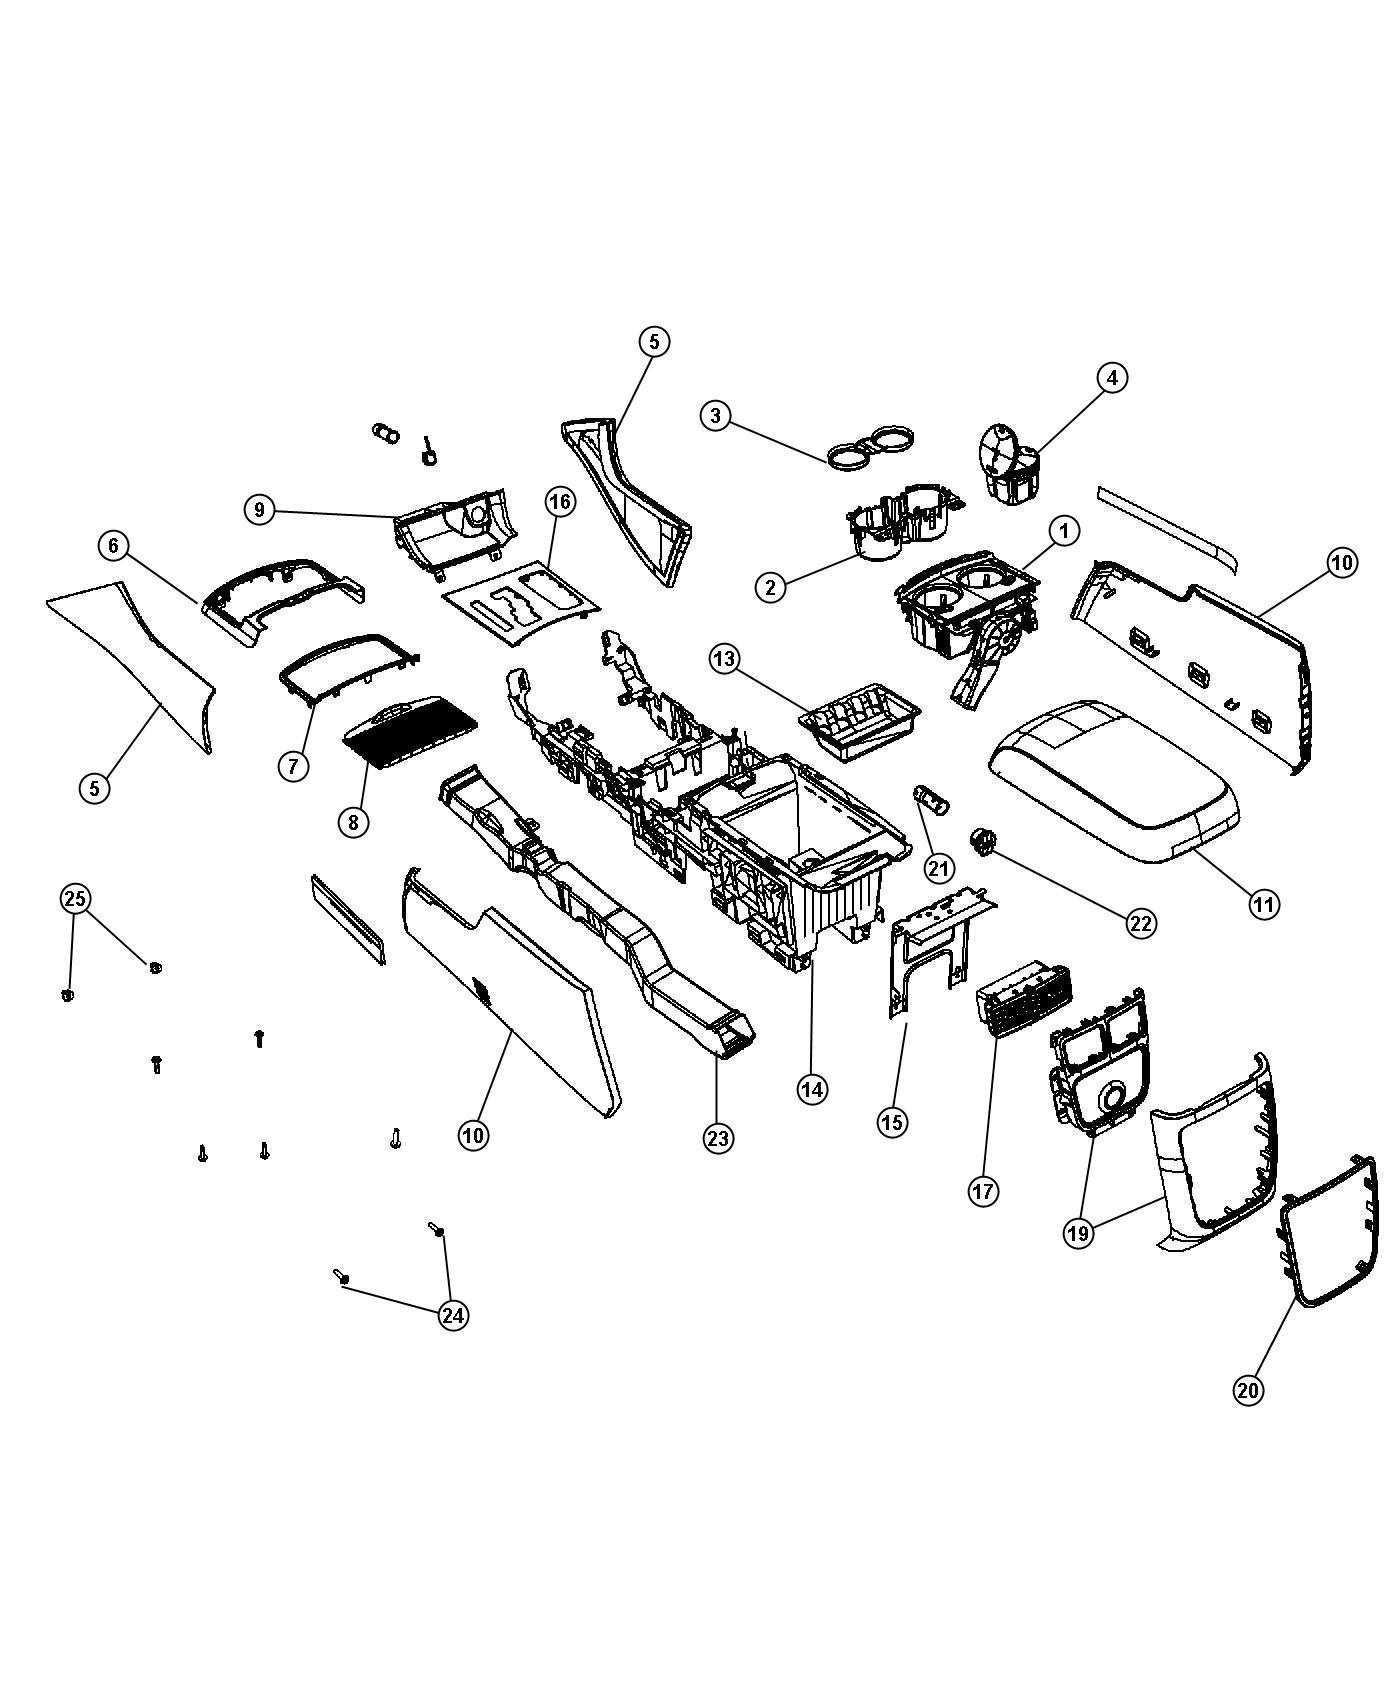 Chrysler 300 Wiring. Jumper. Universal consumer interface